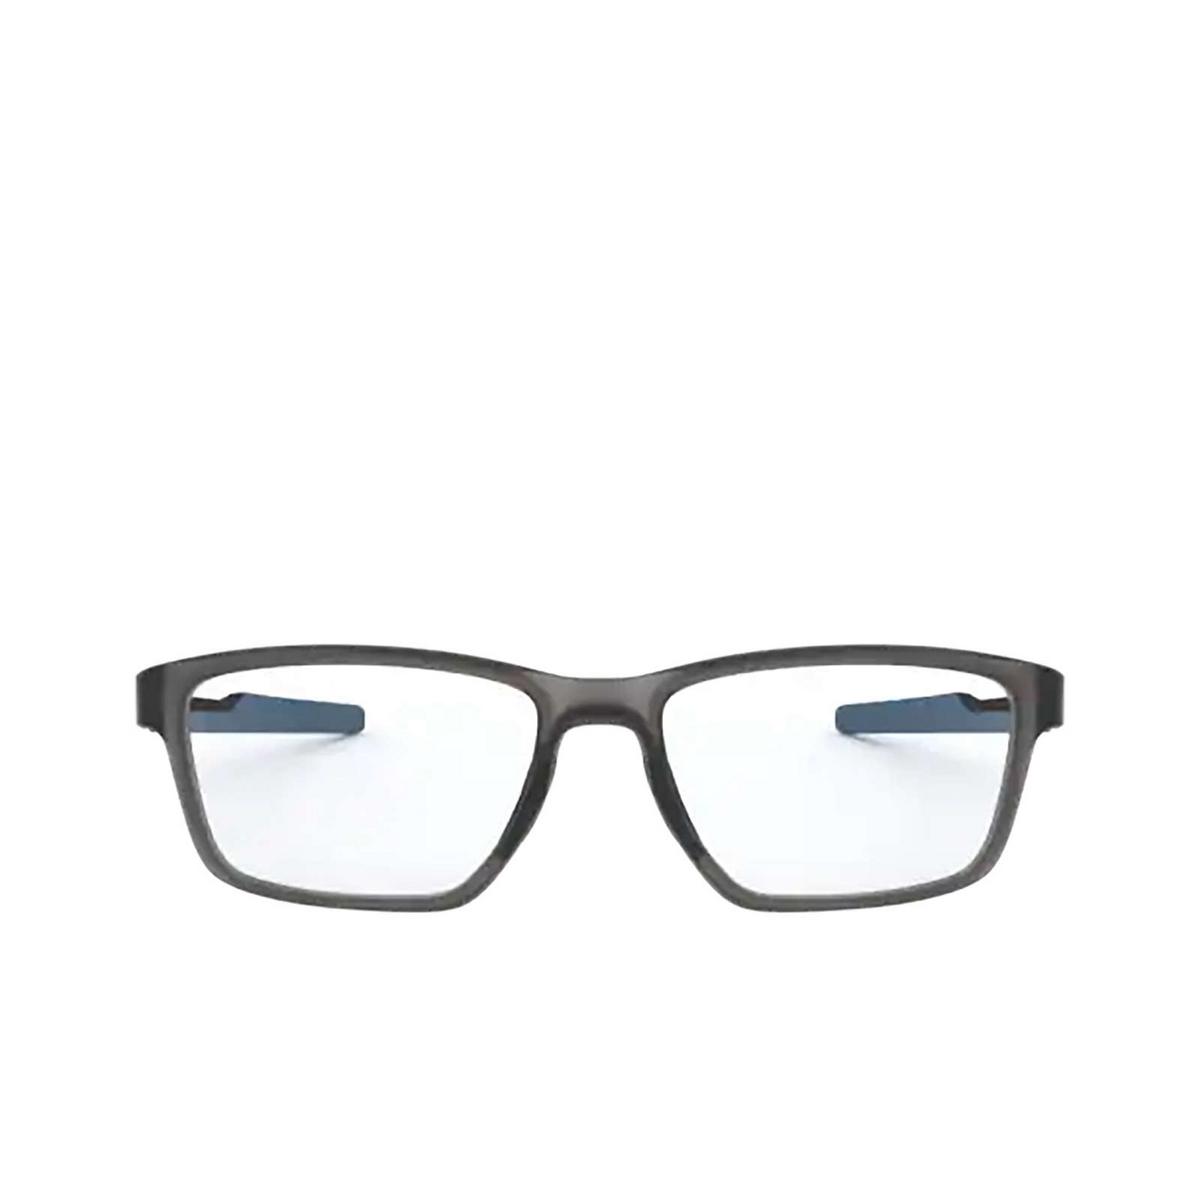 Oakley® Rectangle Eyeglasses: Metalink OX8153 color Satin Grey Smoke 815307 - front view.